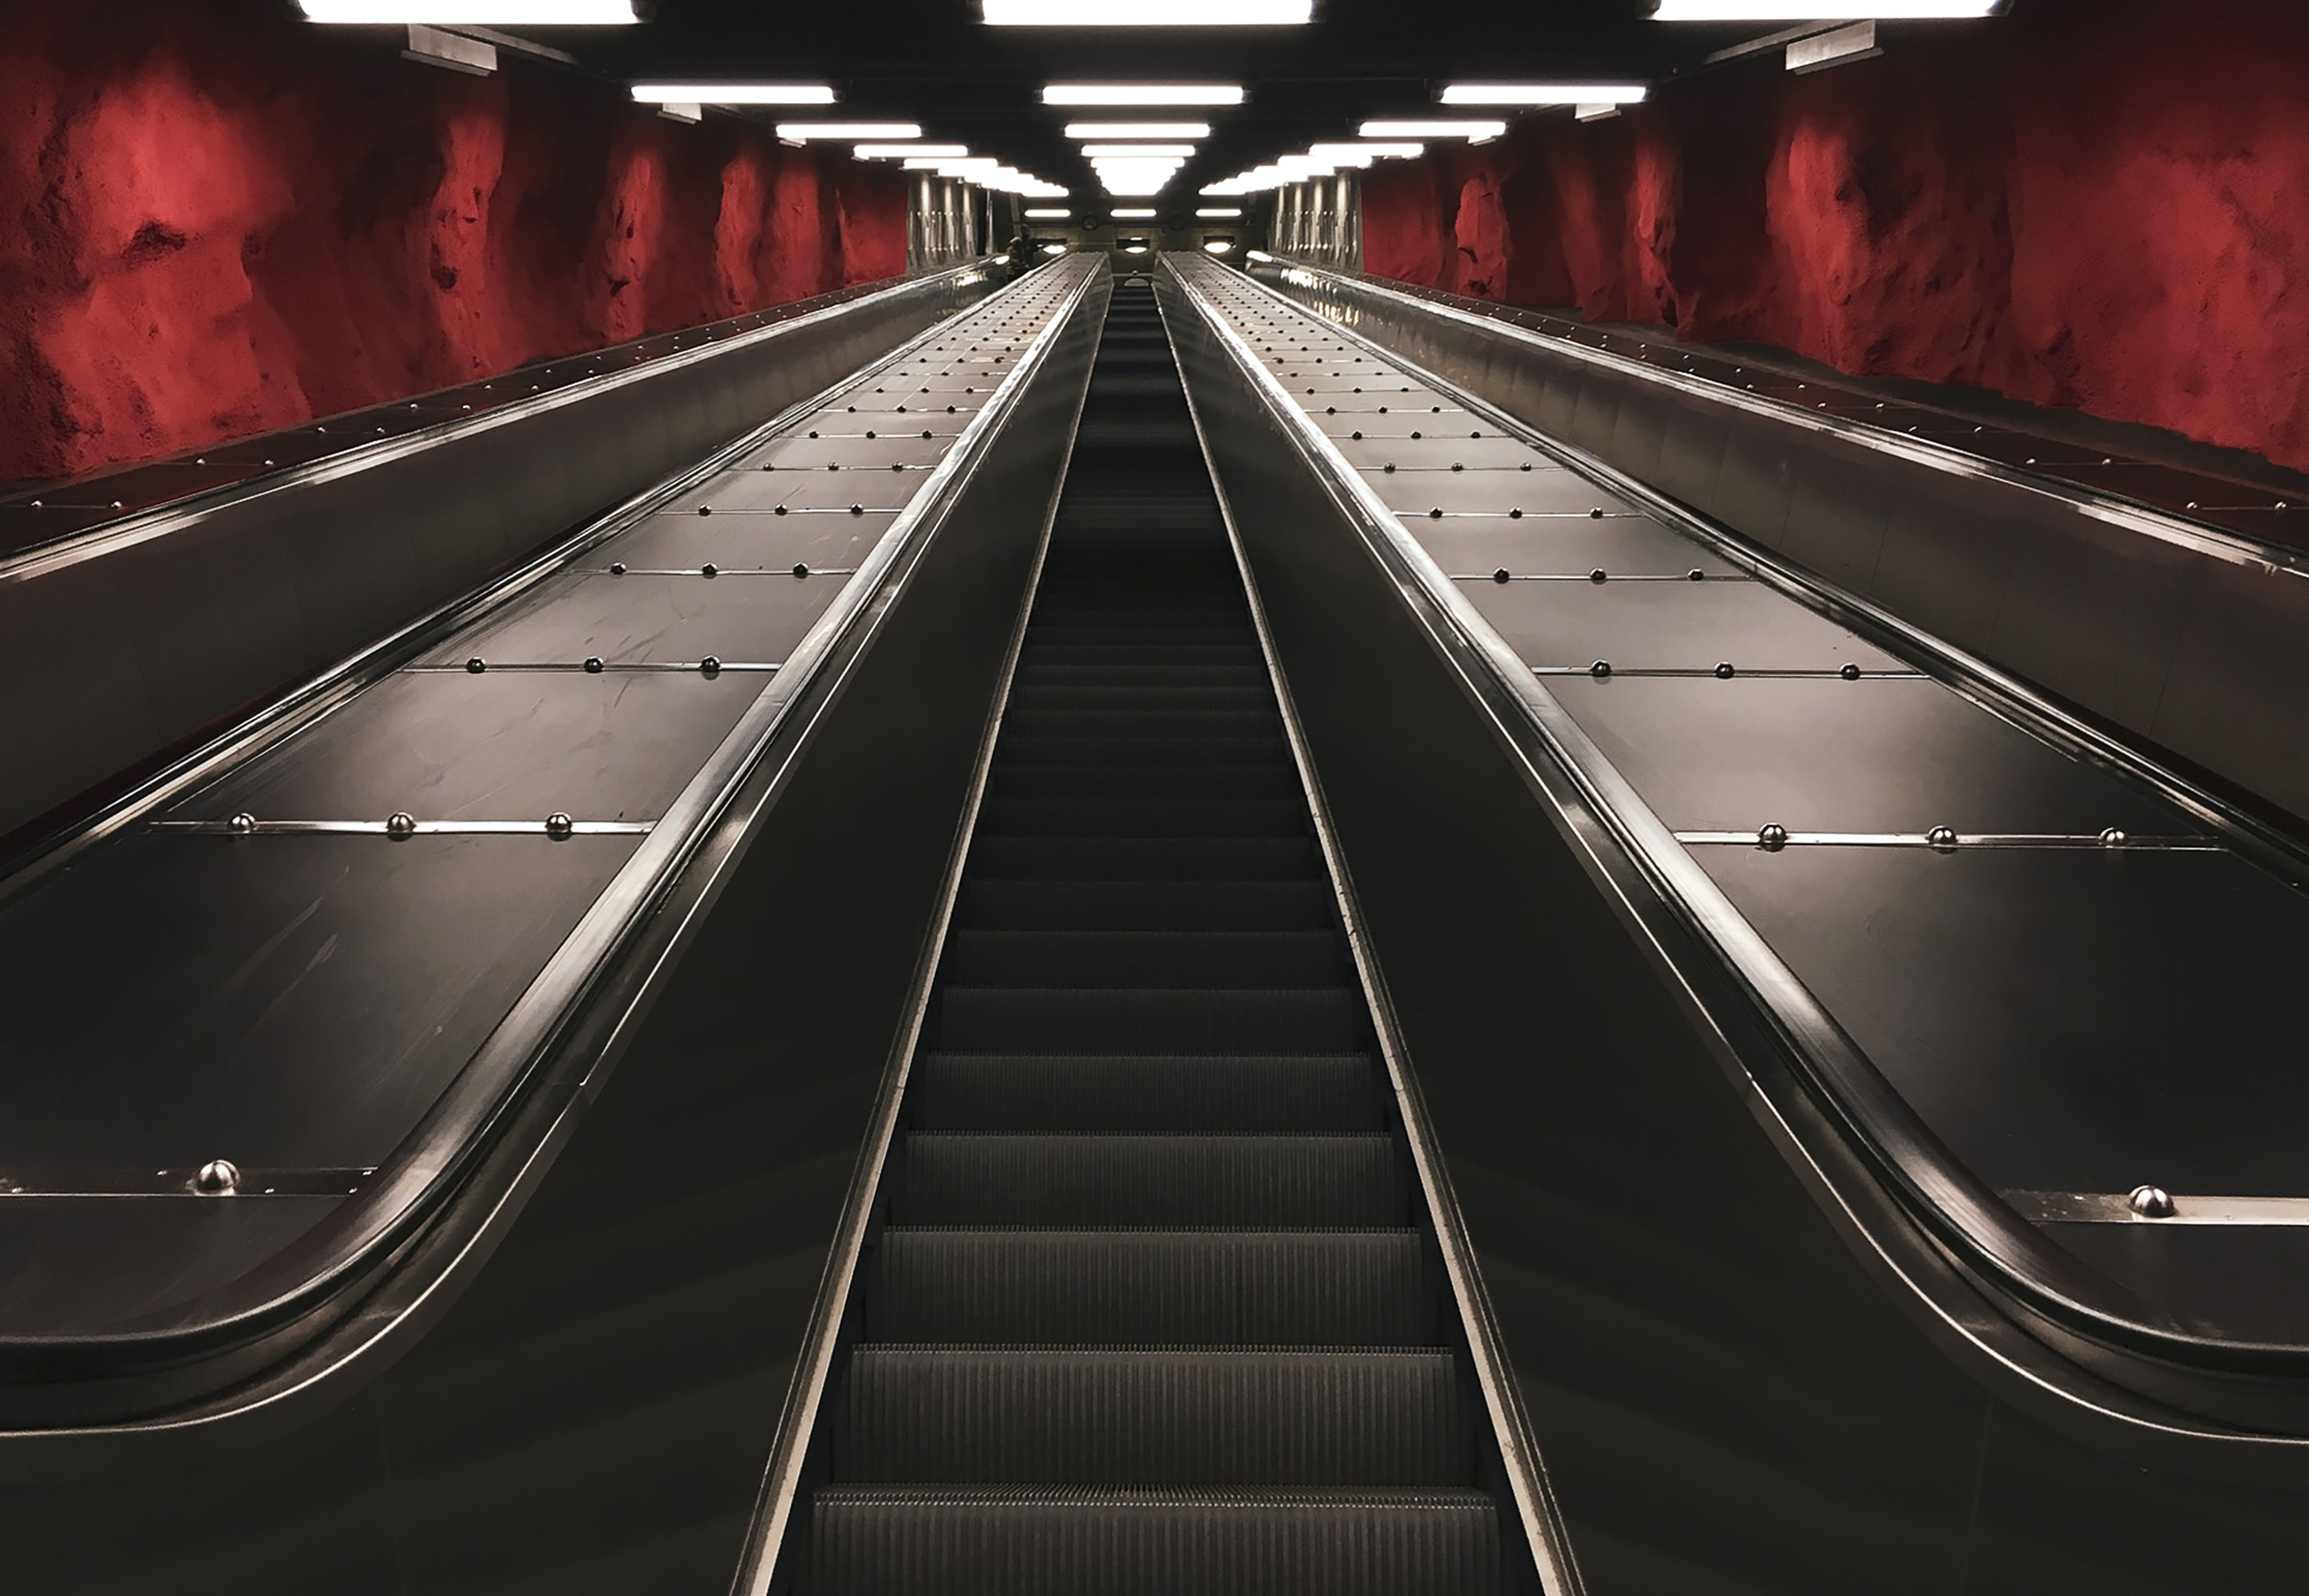 black escalator with no people